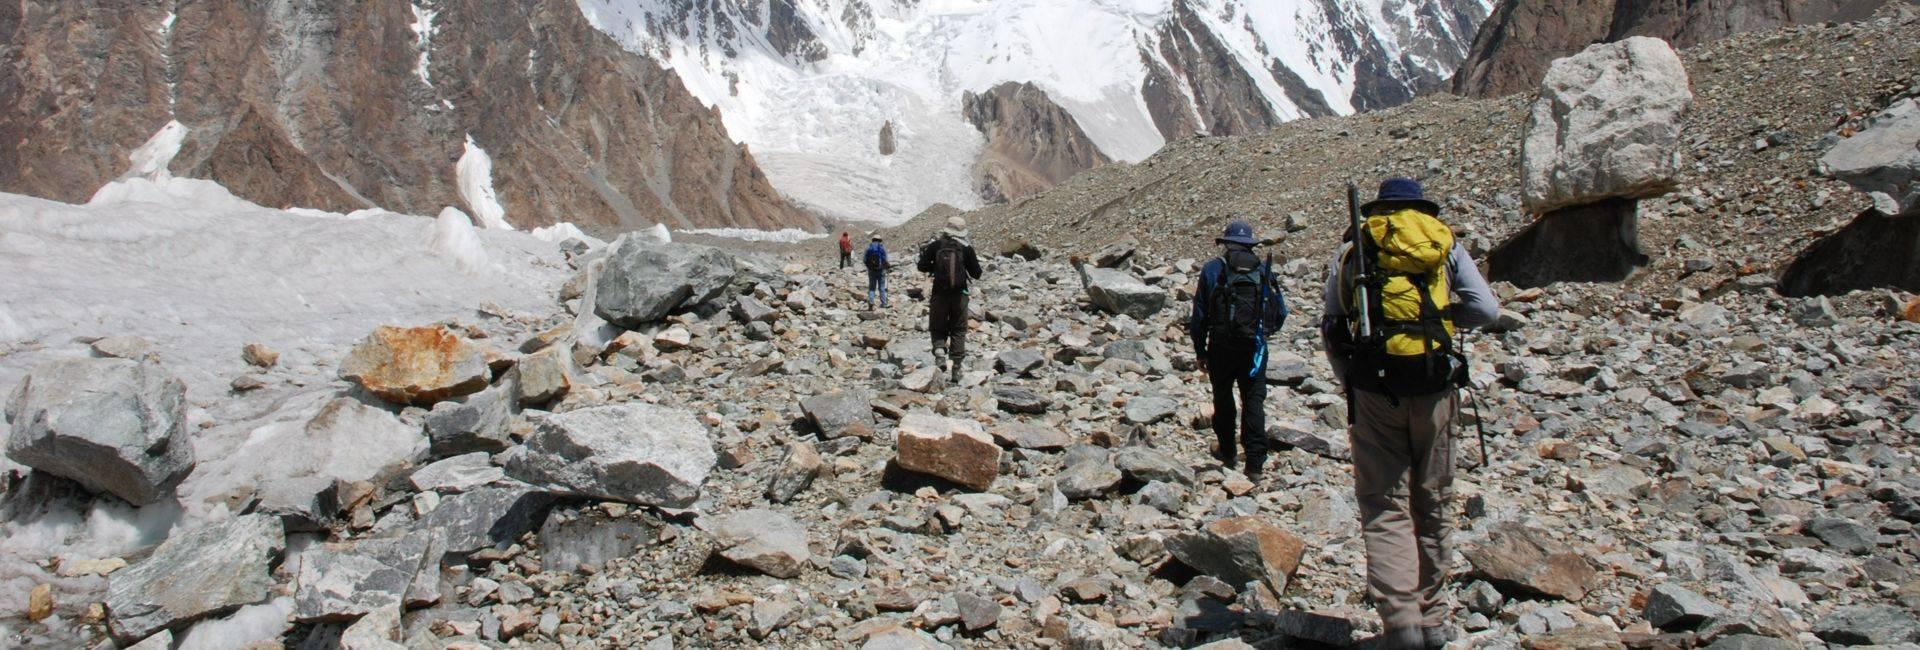 K2 Base Camp & Concordia trek in Pakistan